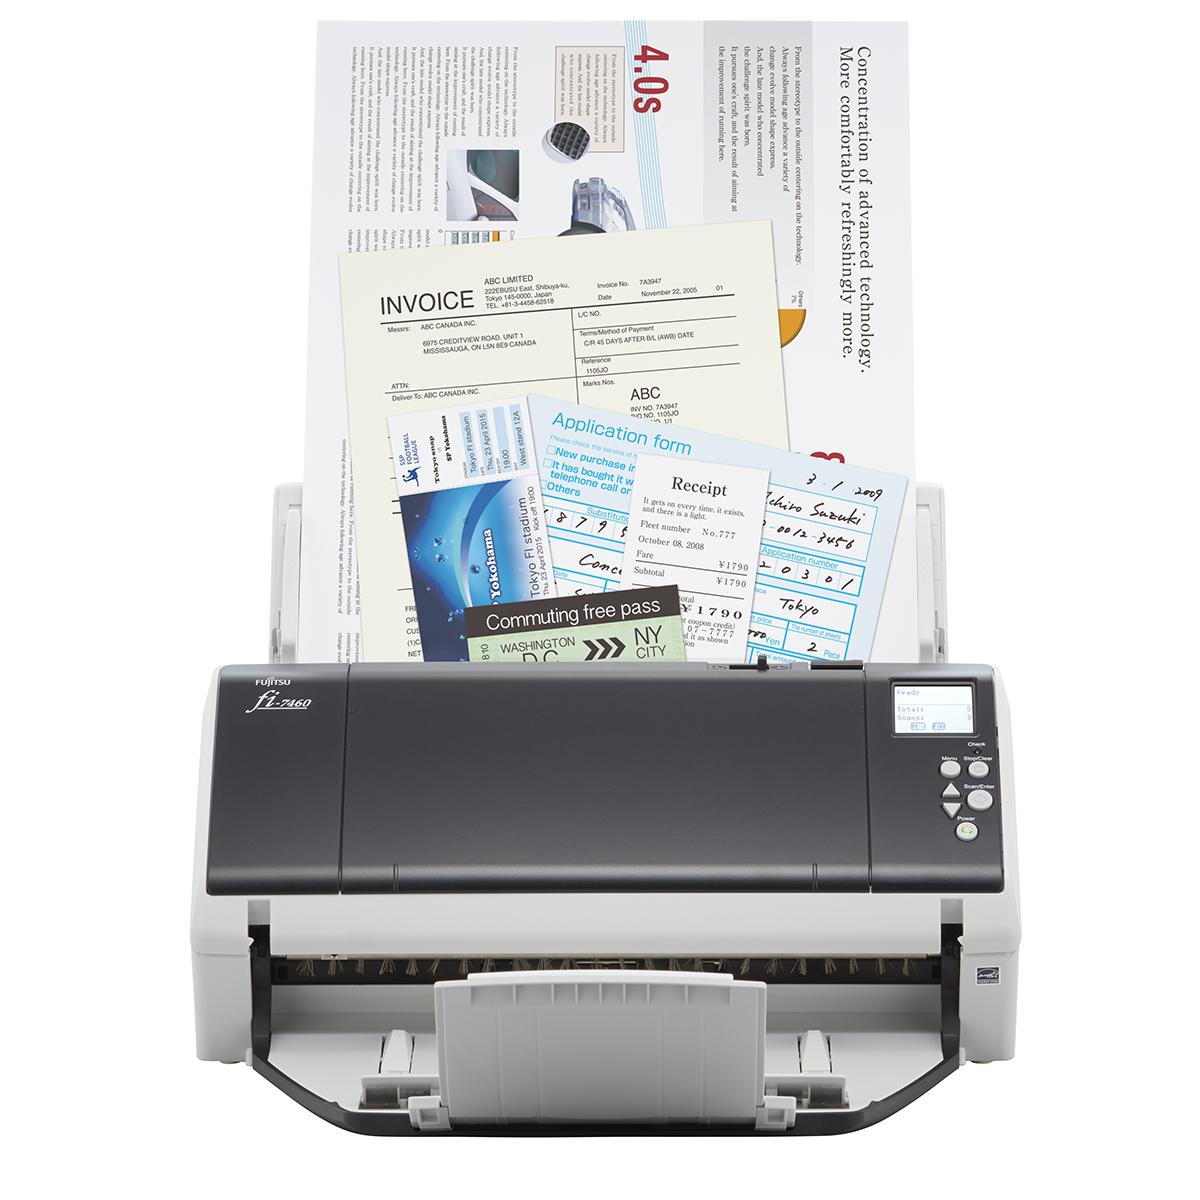 Fujitsu fi-7460 A3 Image Scanner